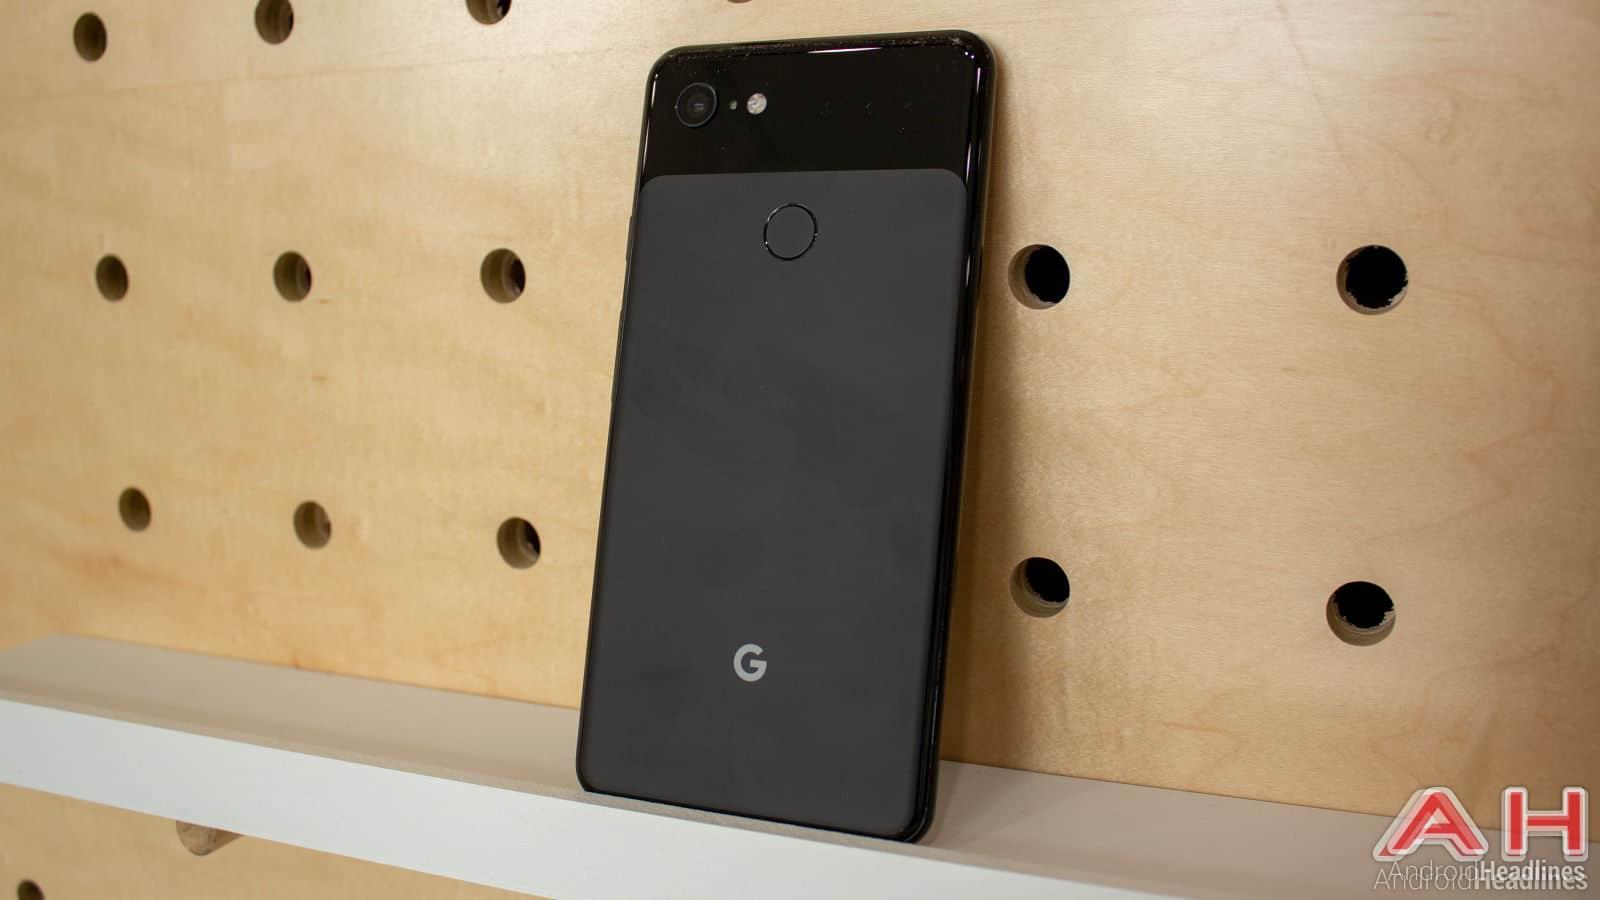 Google Pixel 3 XL Batch 2 AH 4